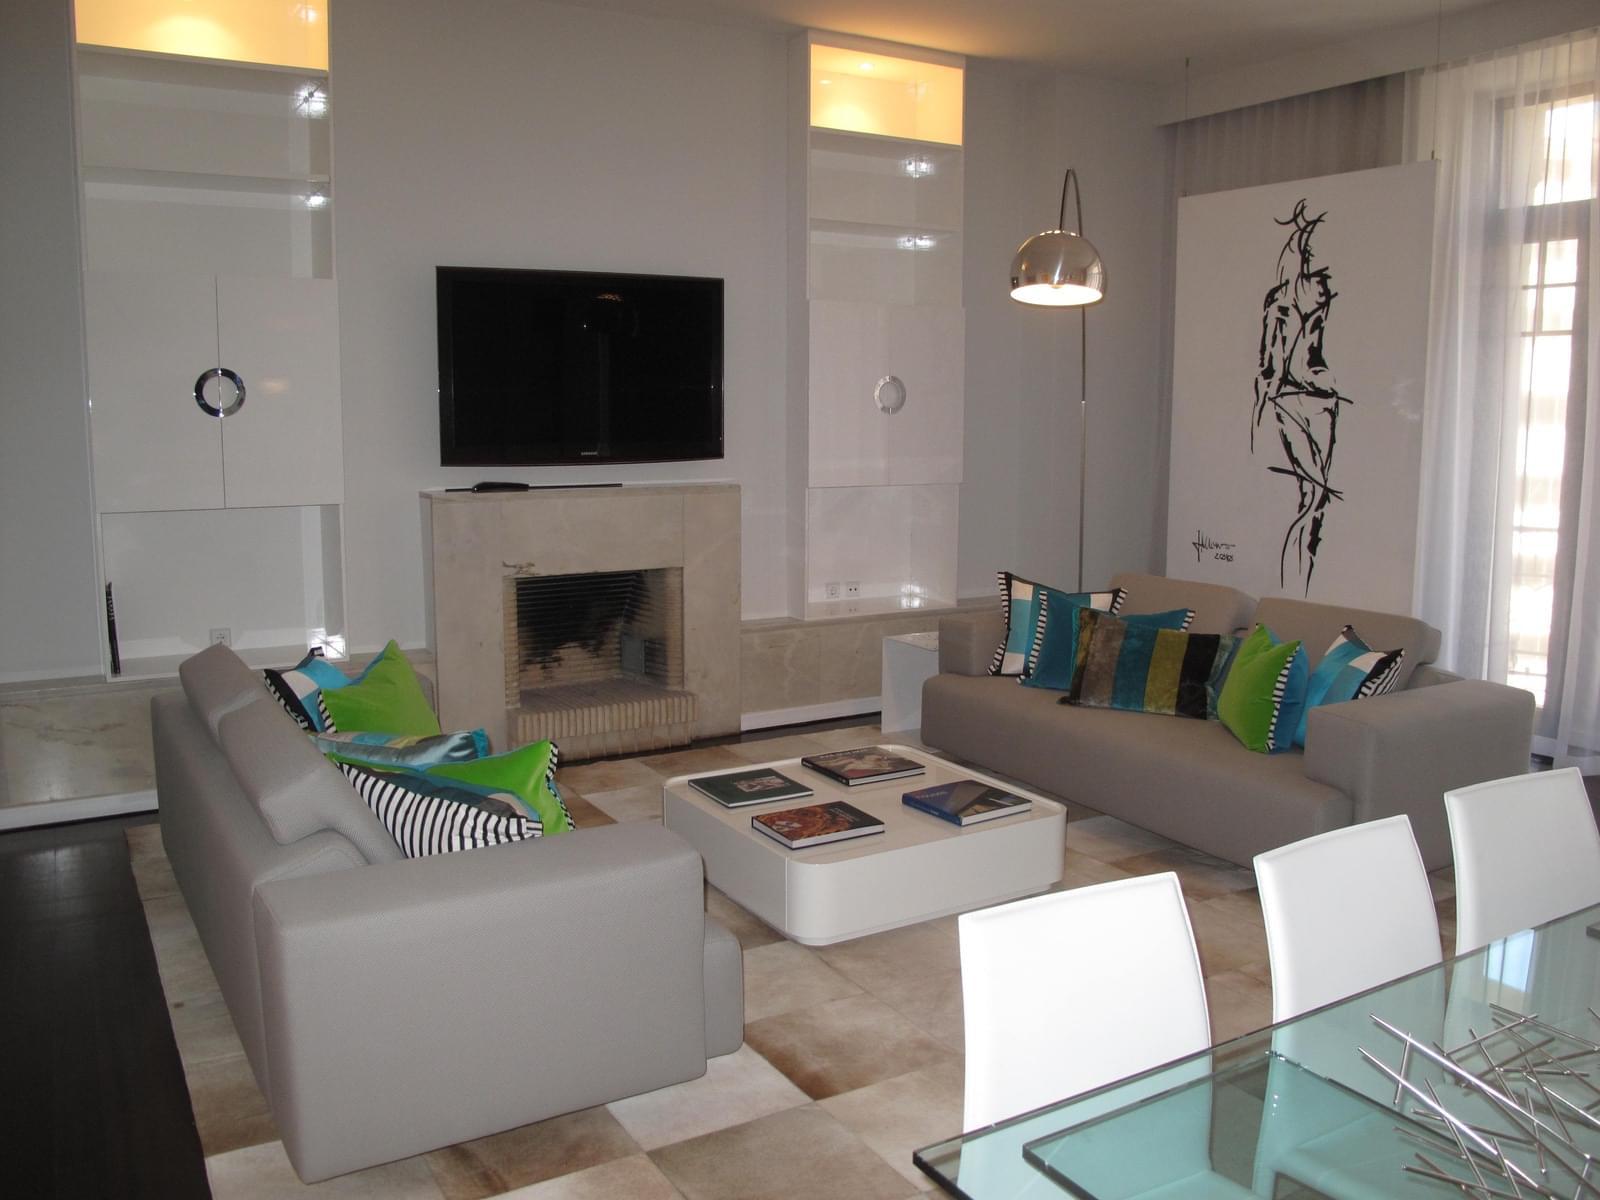 pf18338-apartamento-t2-lisboa-e8a408e0-577e-4a2c-9a0f-4e1d631beffd